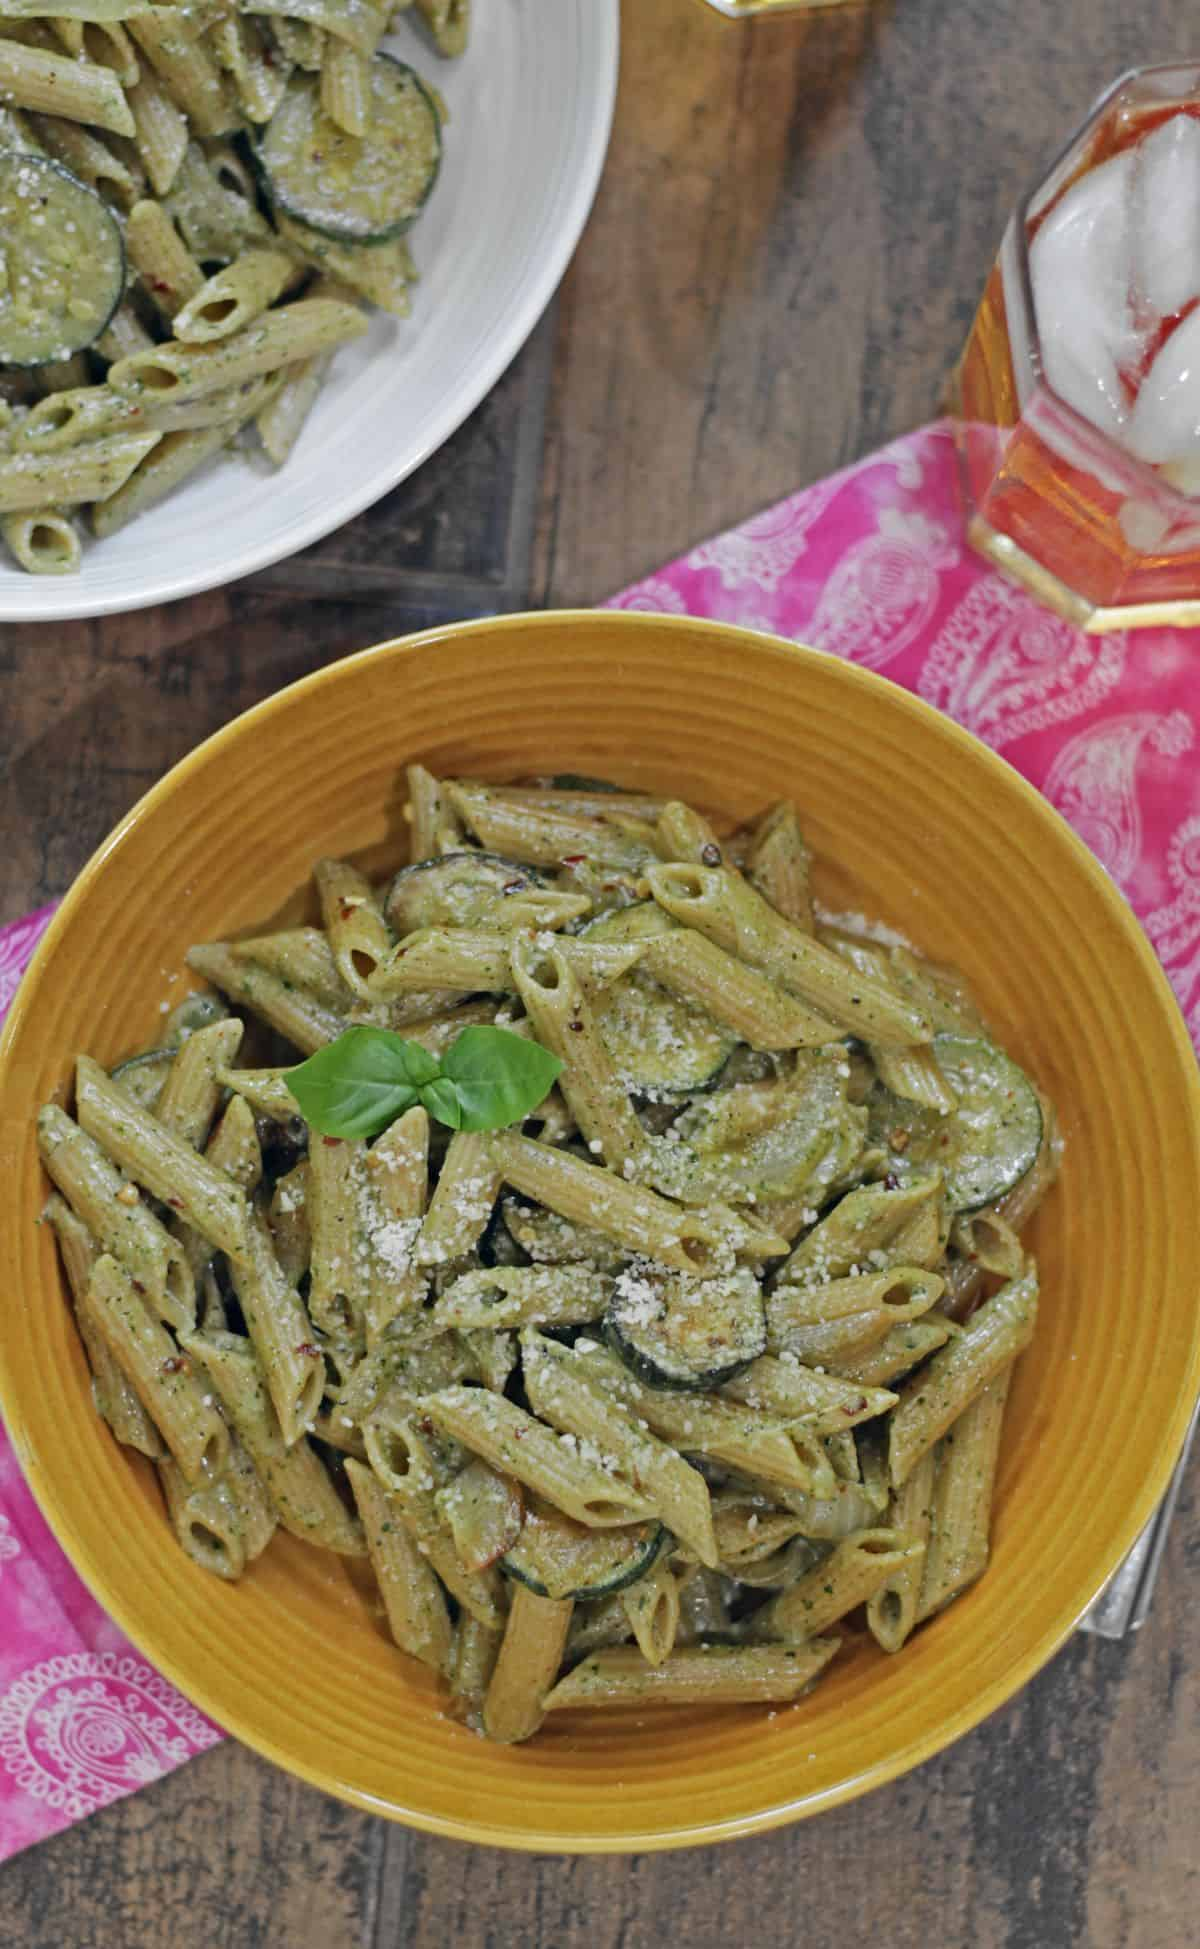 zucchini pesto pasta in a yellow bowl garnished with fresh basil